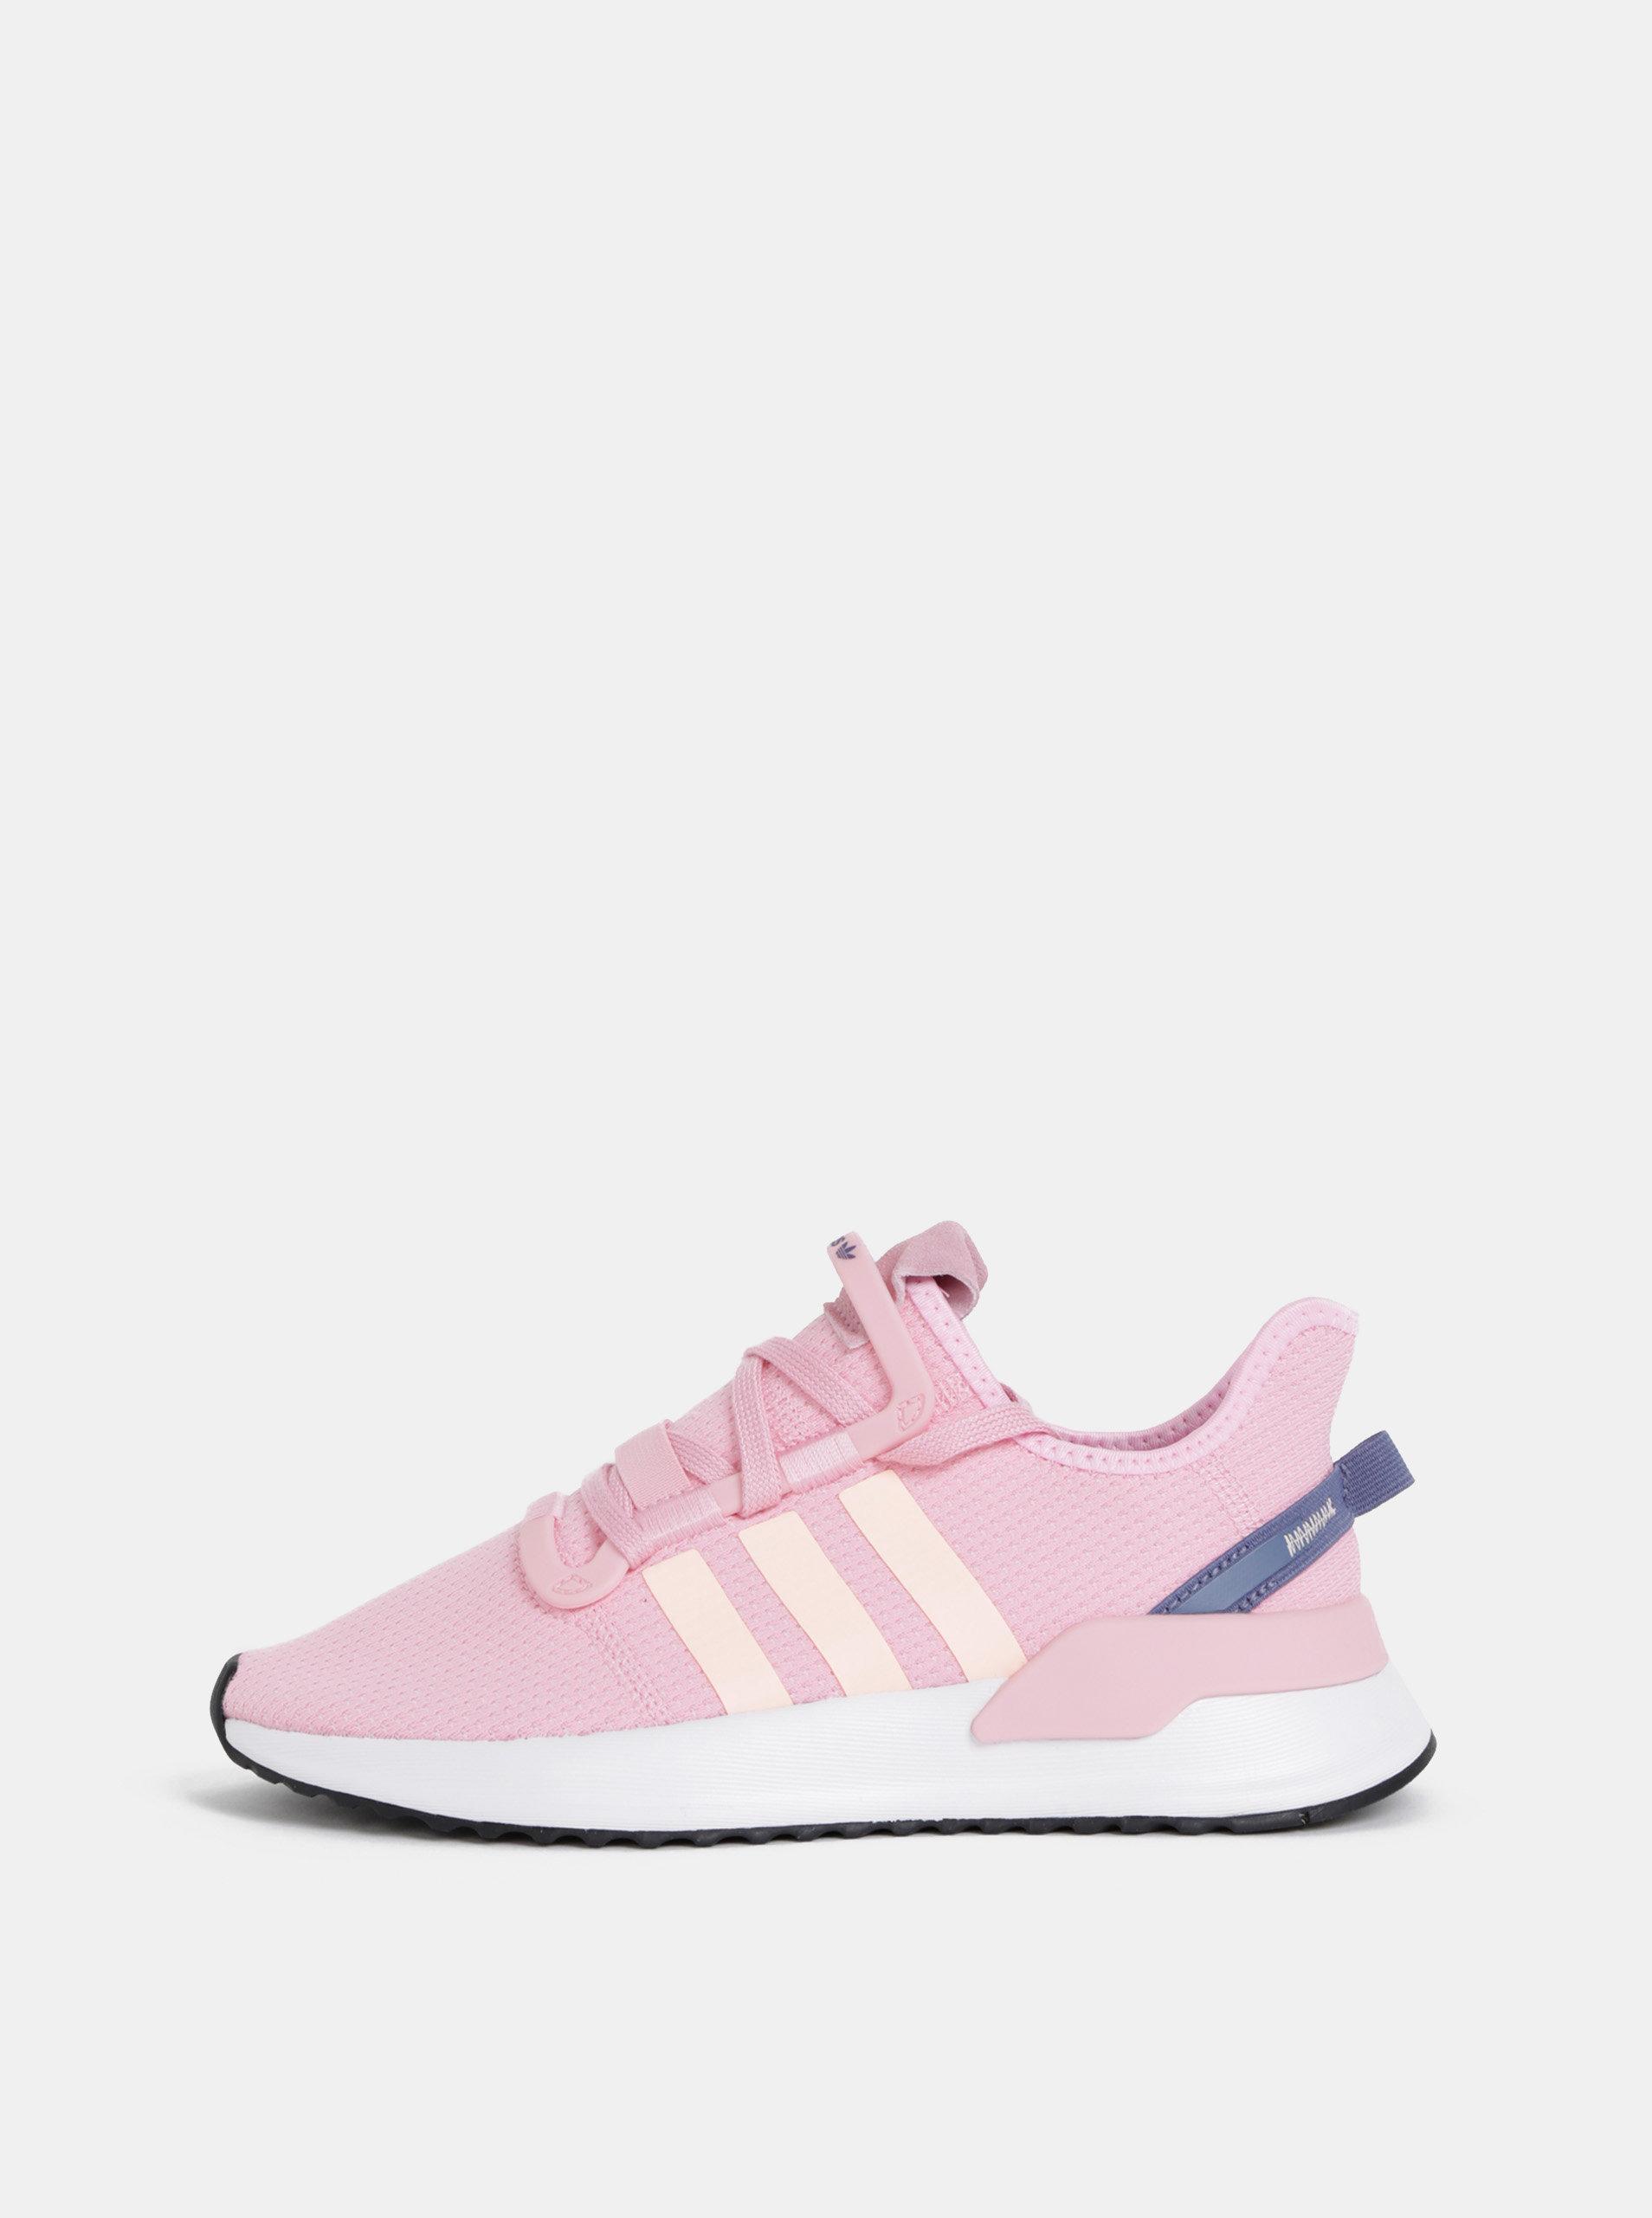 04dde9b16deea Ružové dámske tenisky adidas Originals U_Path Run | ZOOT.sk